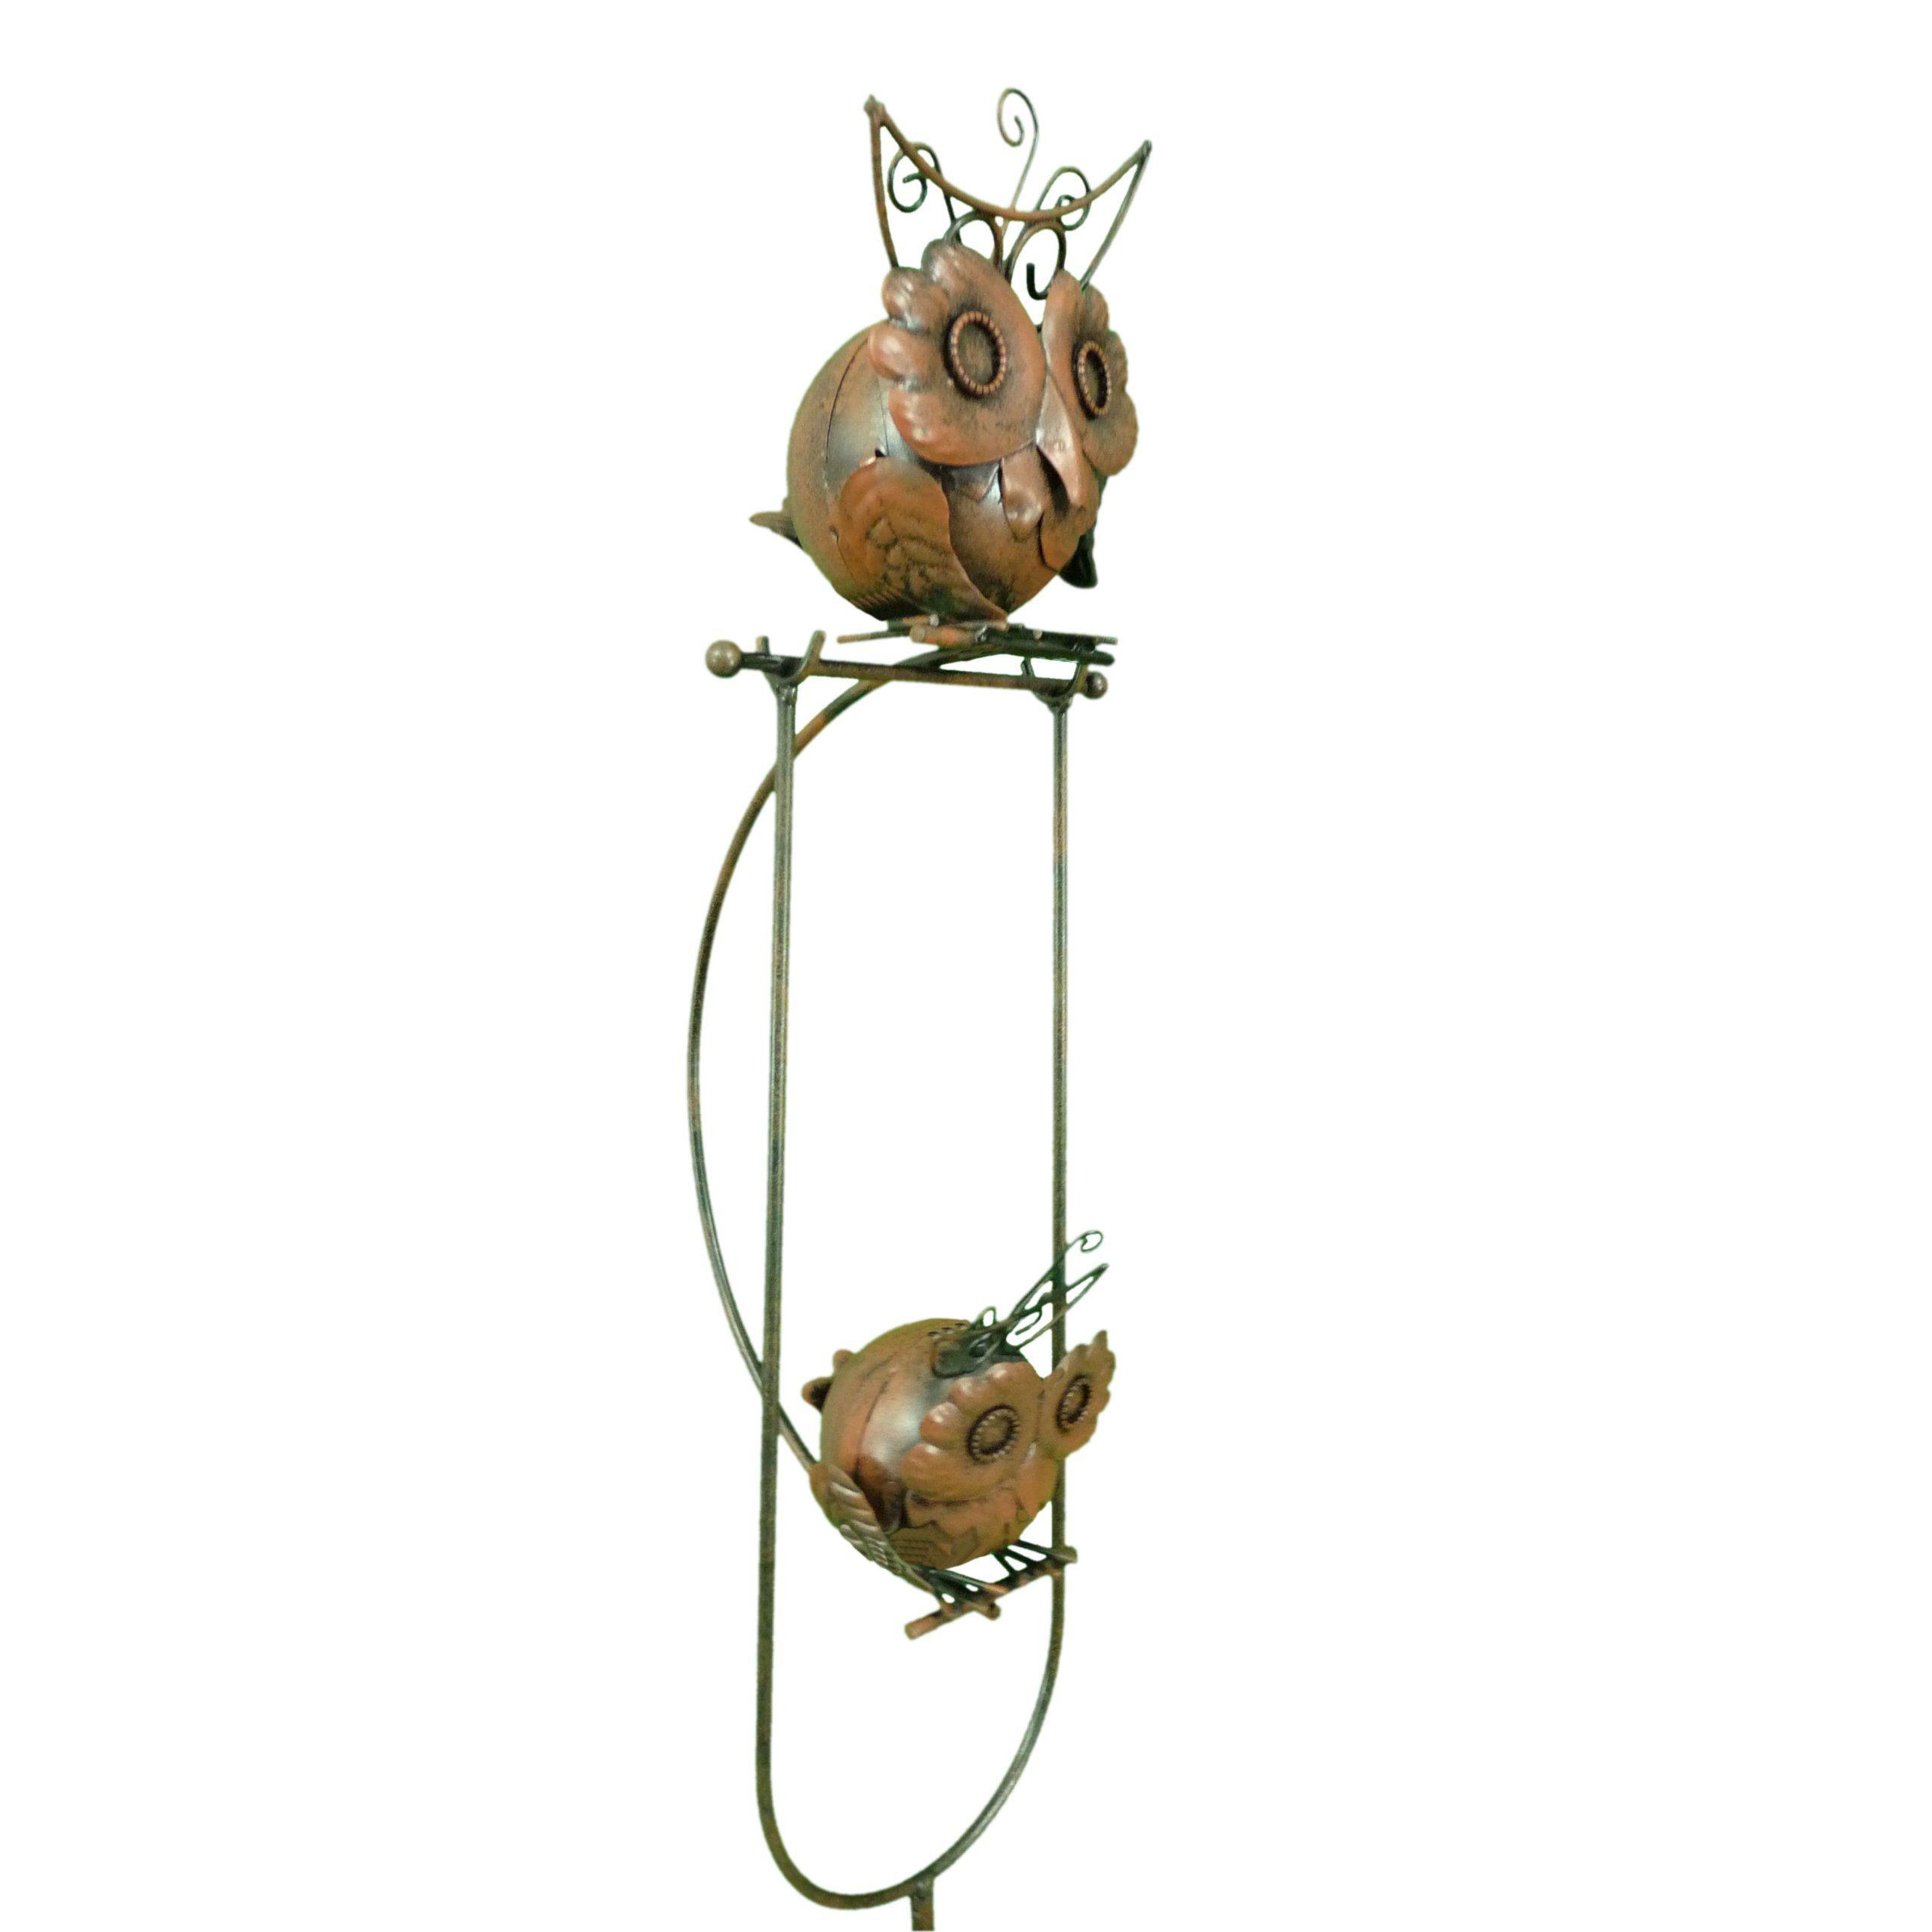 East2eden Rocking Balancing Fat Owls Metal Garden Wind Spinner Ornament